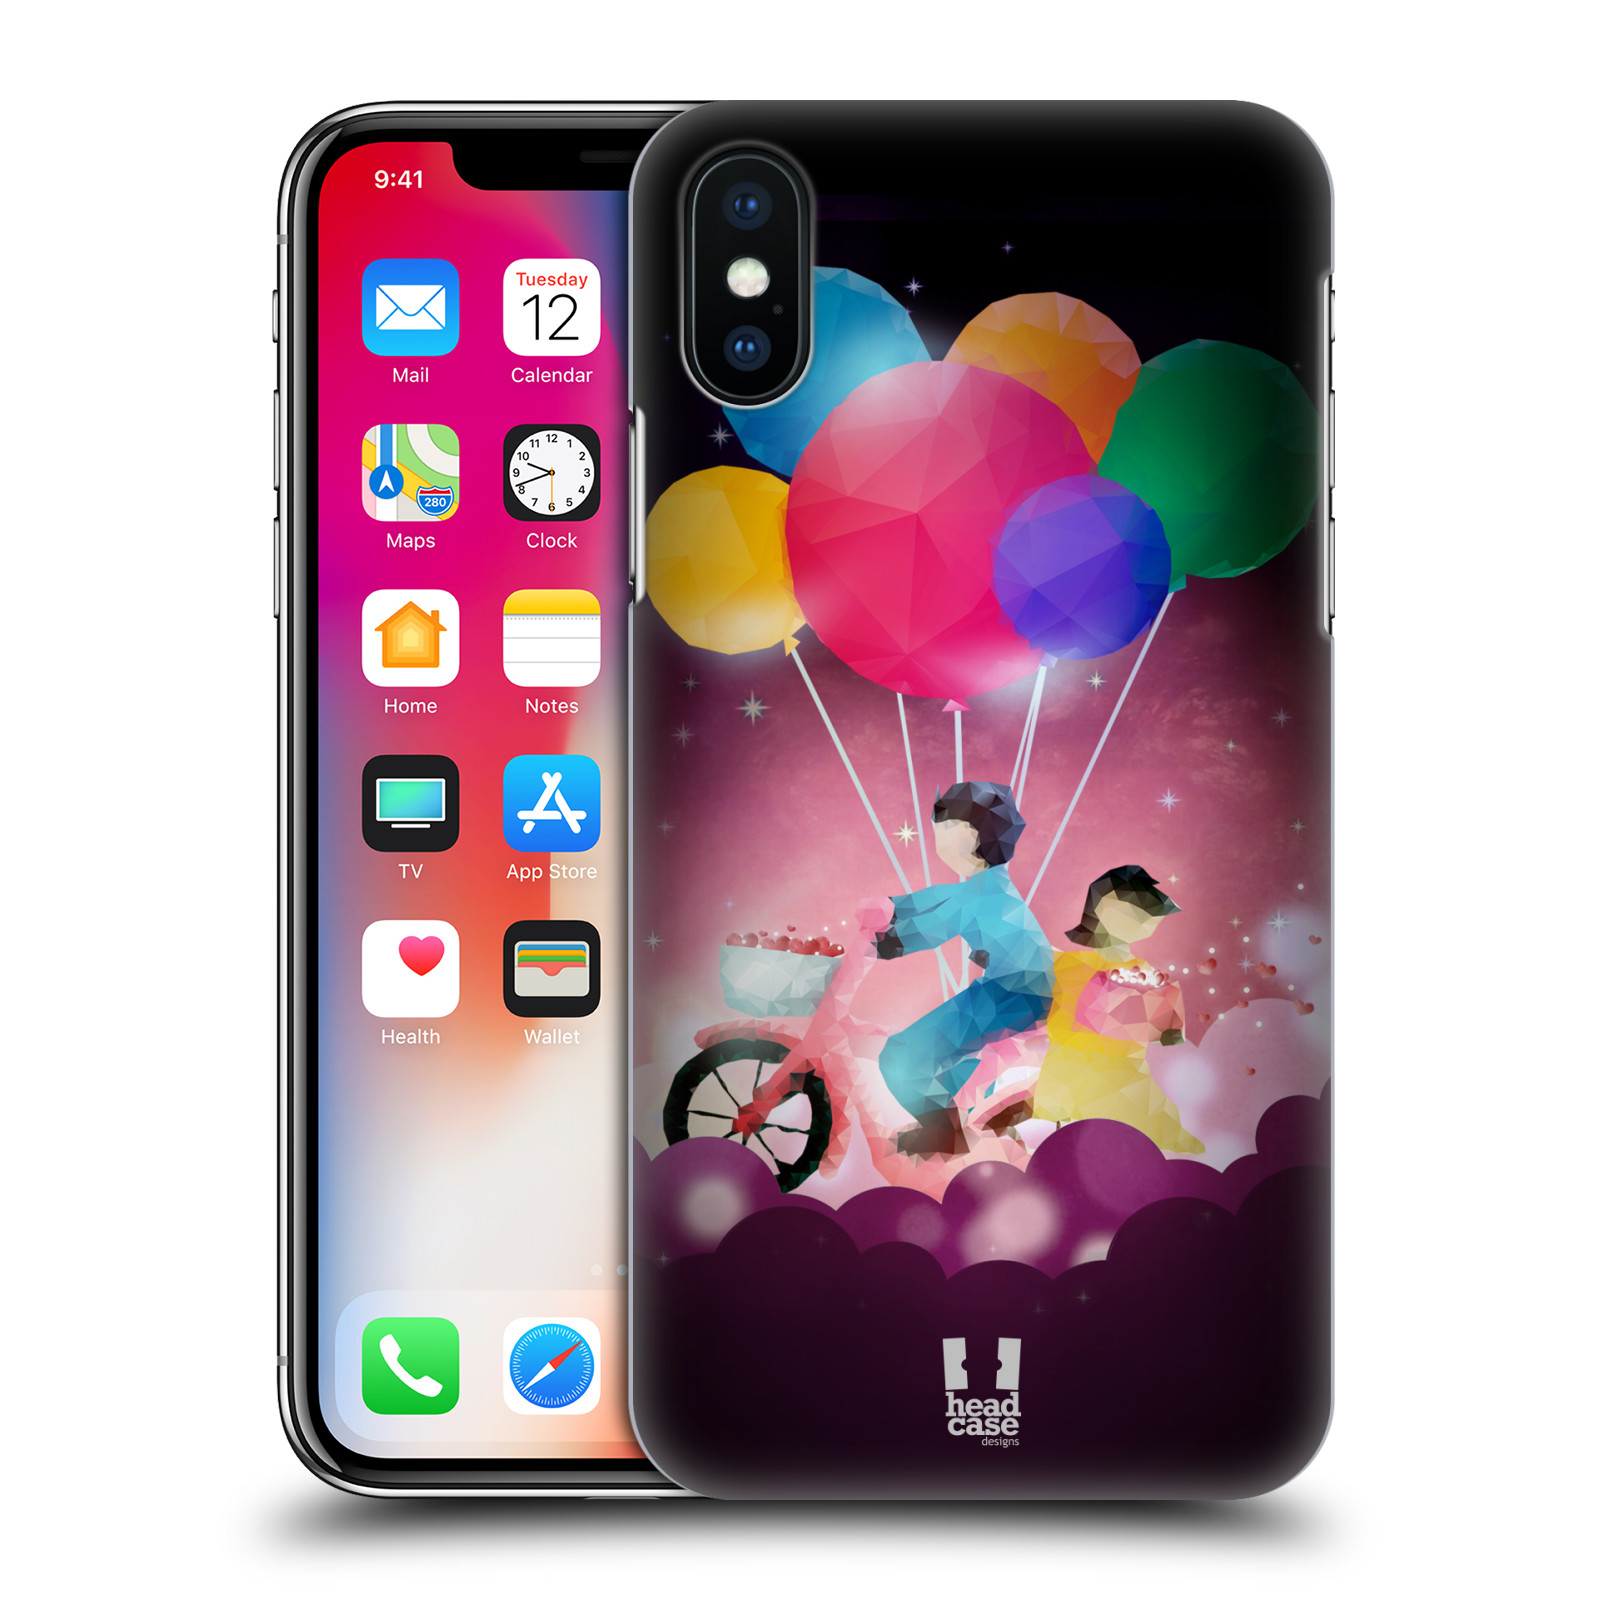 HEAD-CASE-DESIGNS-LOVE-AFLOAT-HARD-BACK-CASE-FOR-APPLE-iPHONE-X